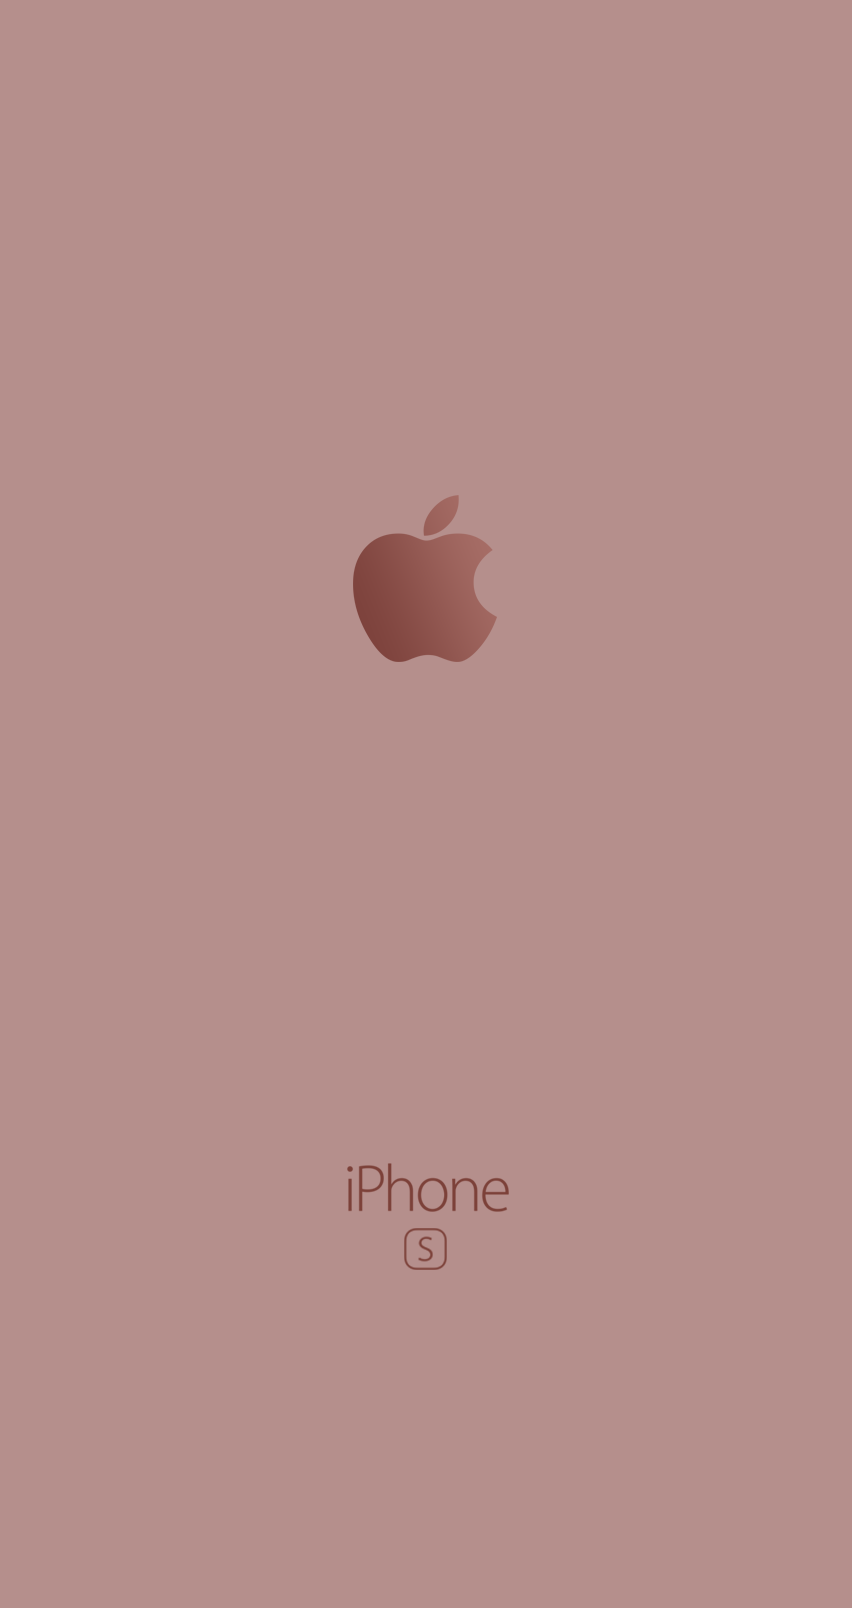 Iphone 6s Wallpaper Pink Logo Apple Fond D Ecran Rose Oboi Dlya Iphone Oboi Yabloko Oboi